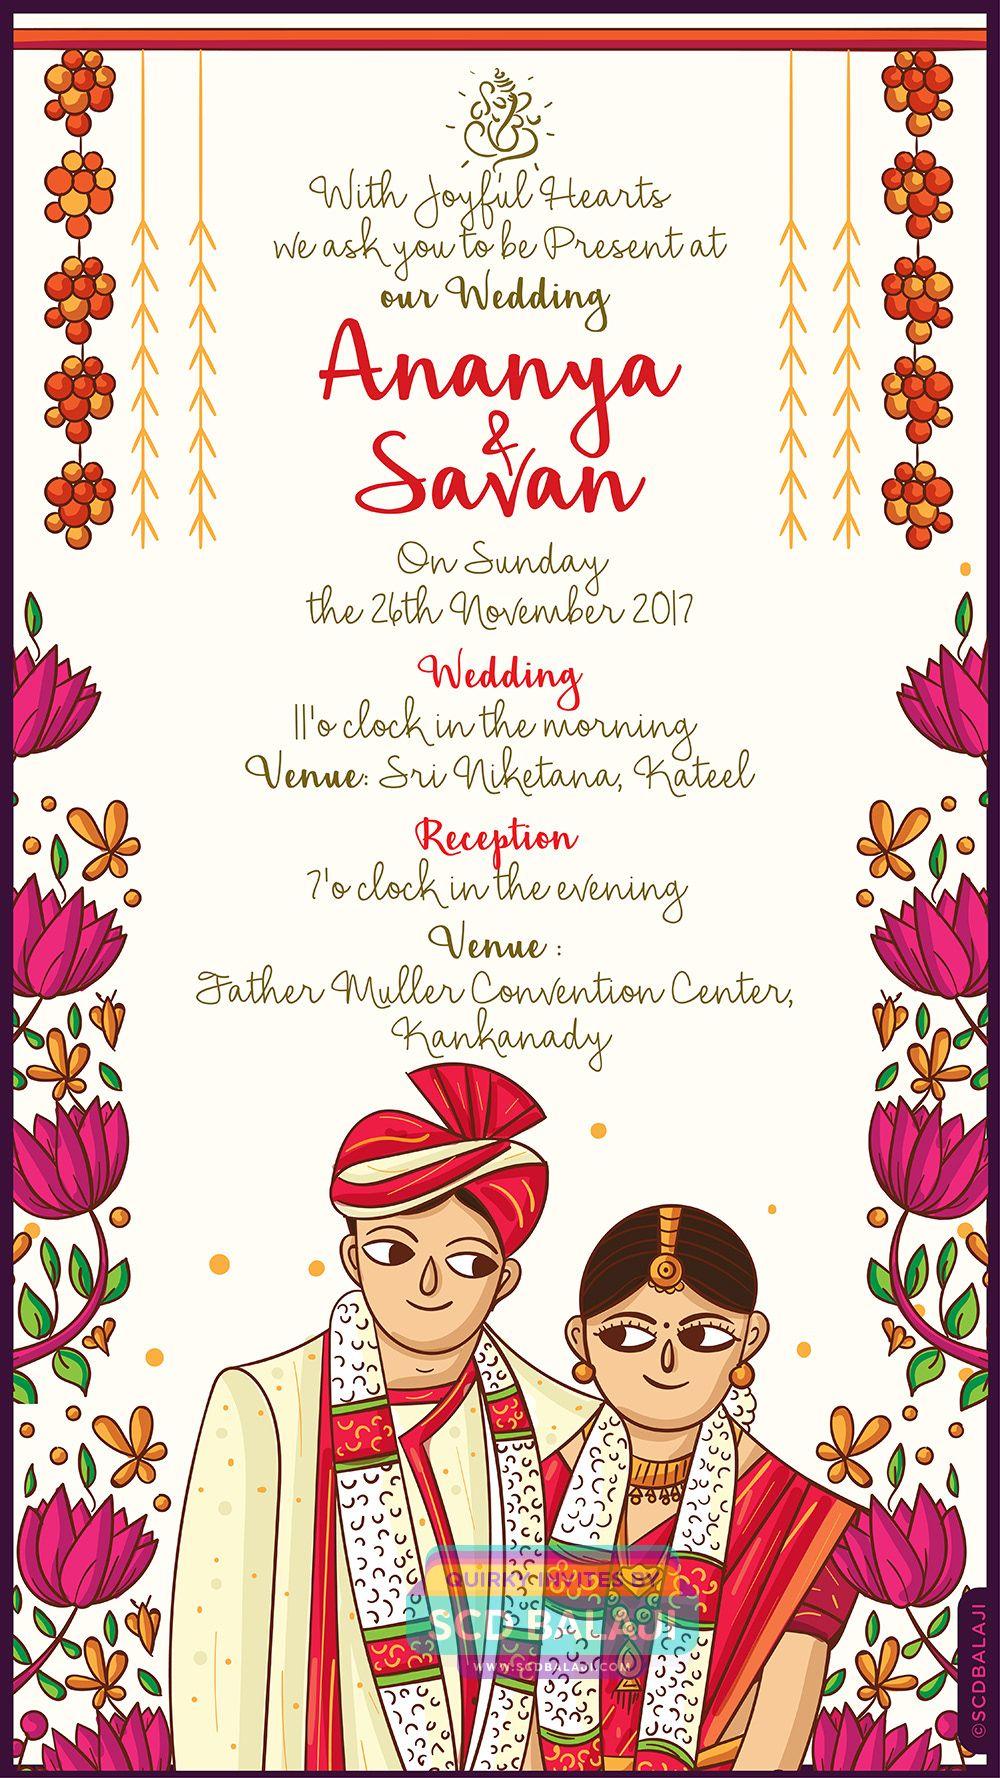 E Invites Design Portfolio Home Of Email Whatsapp Invitations Electronic Wedding Invitations Email Wedding Invitations Wedding Invitation Card Design